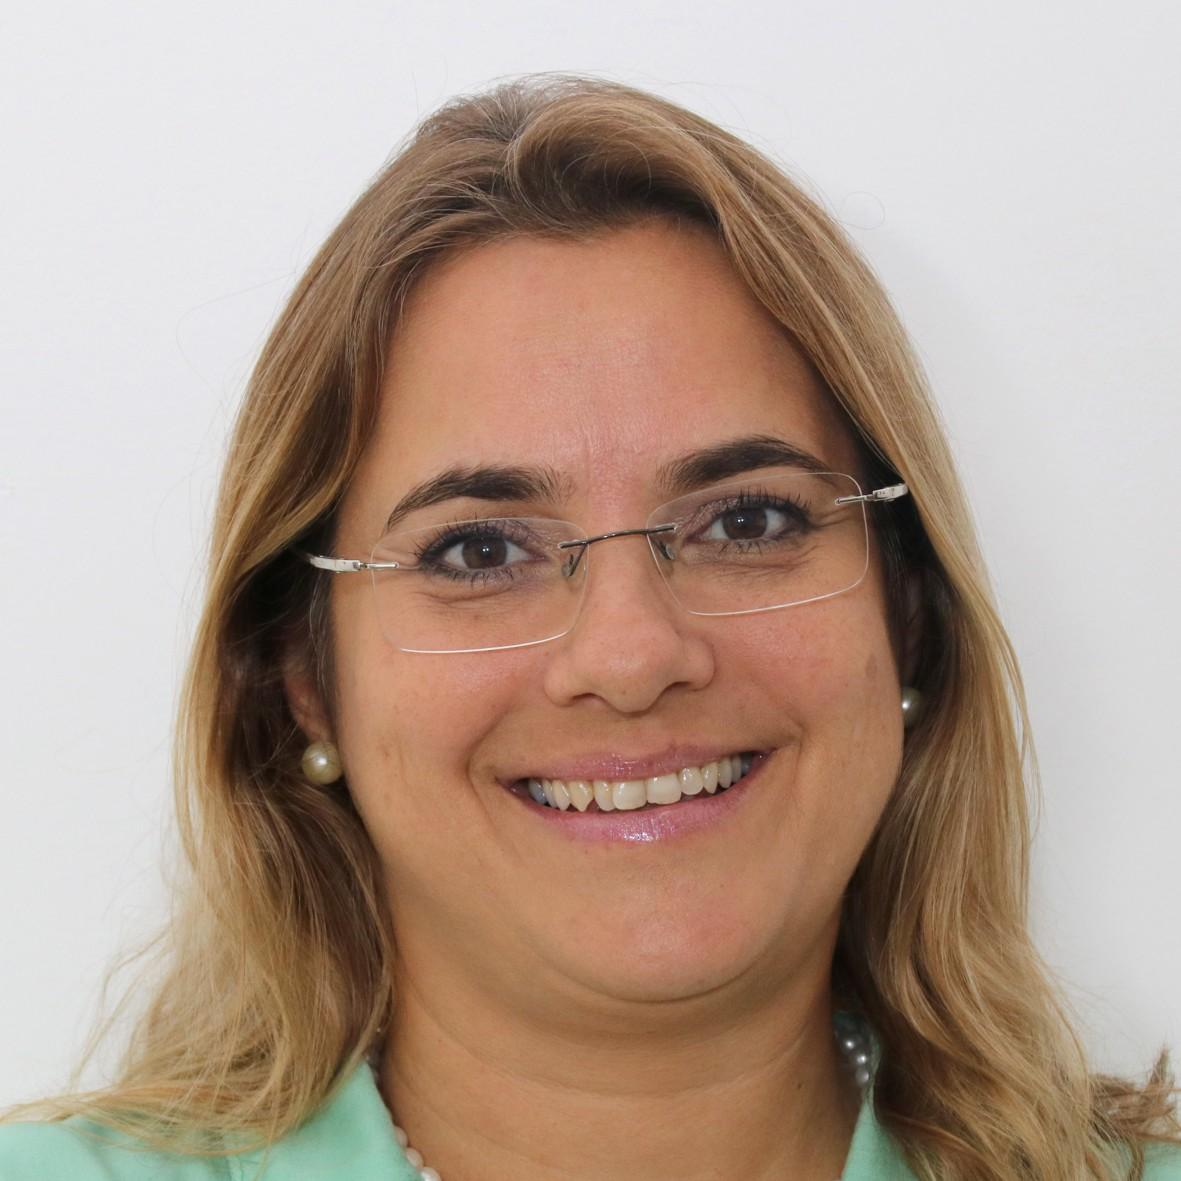 Ana Rita Abelho